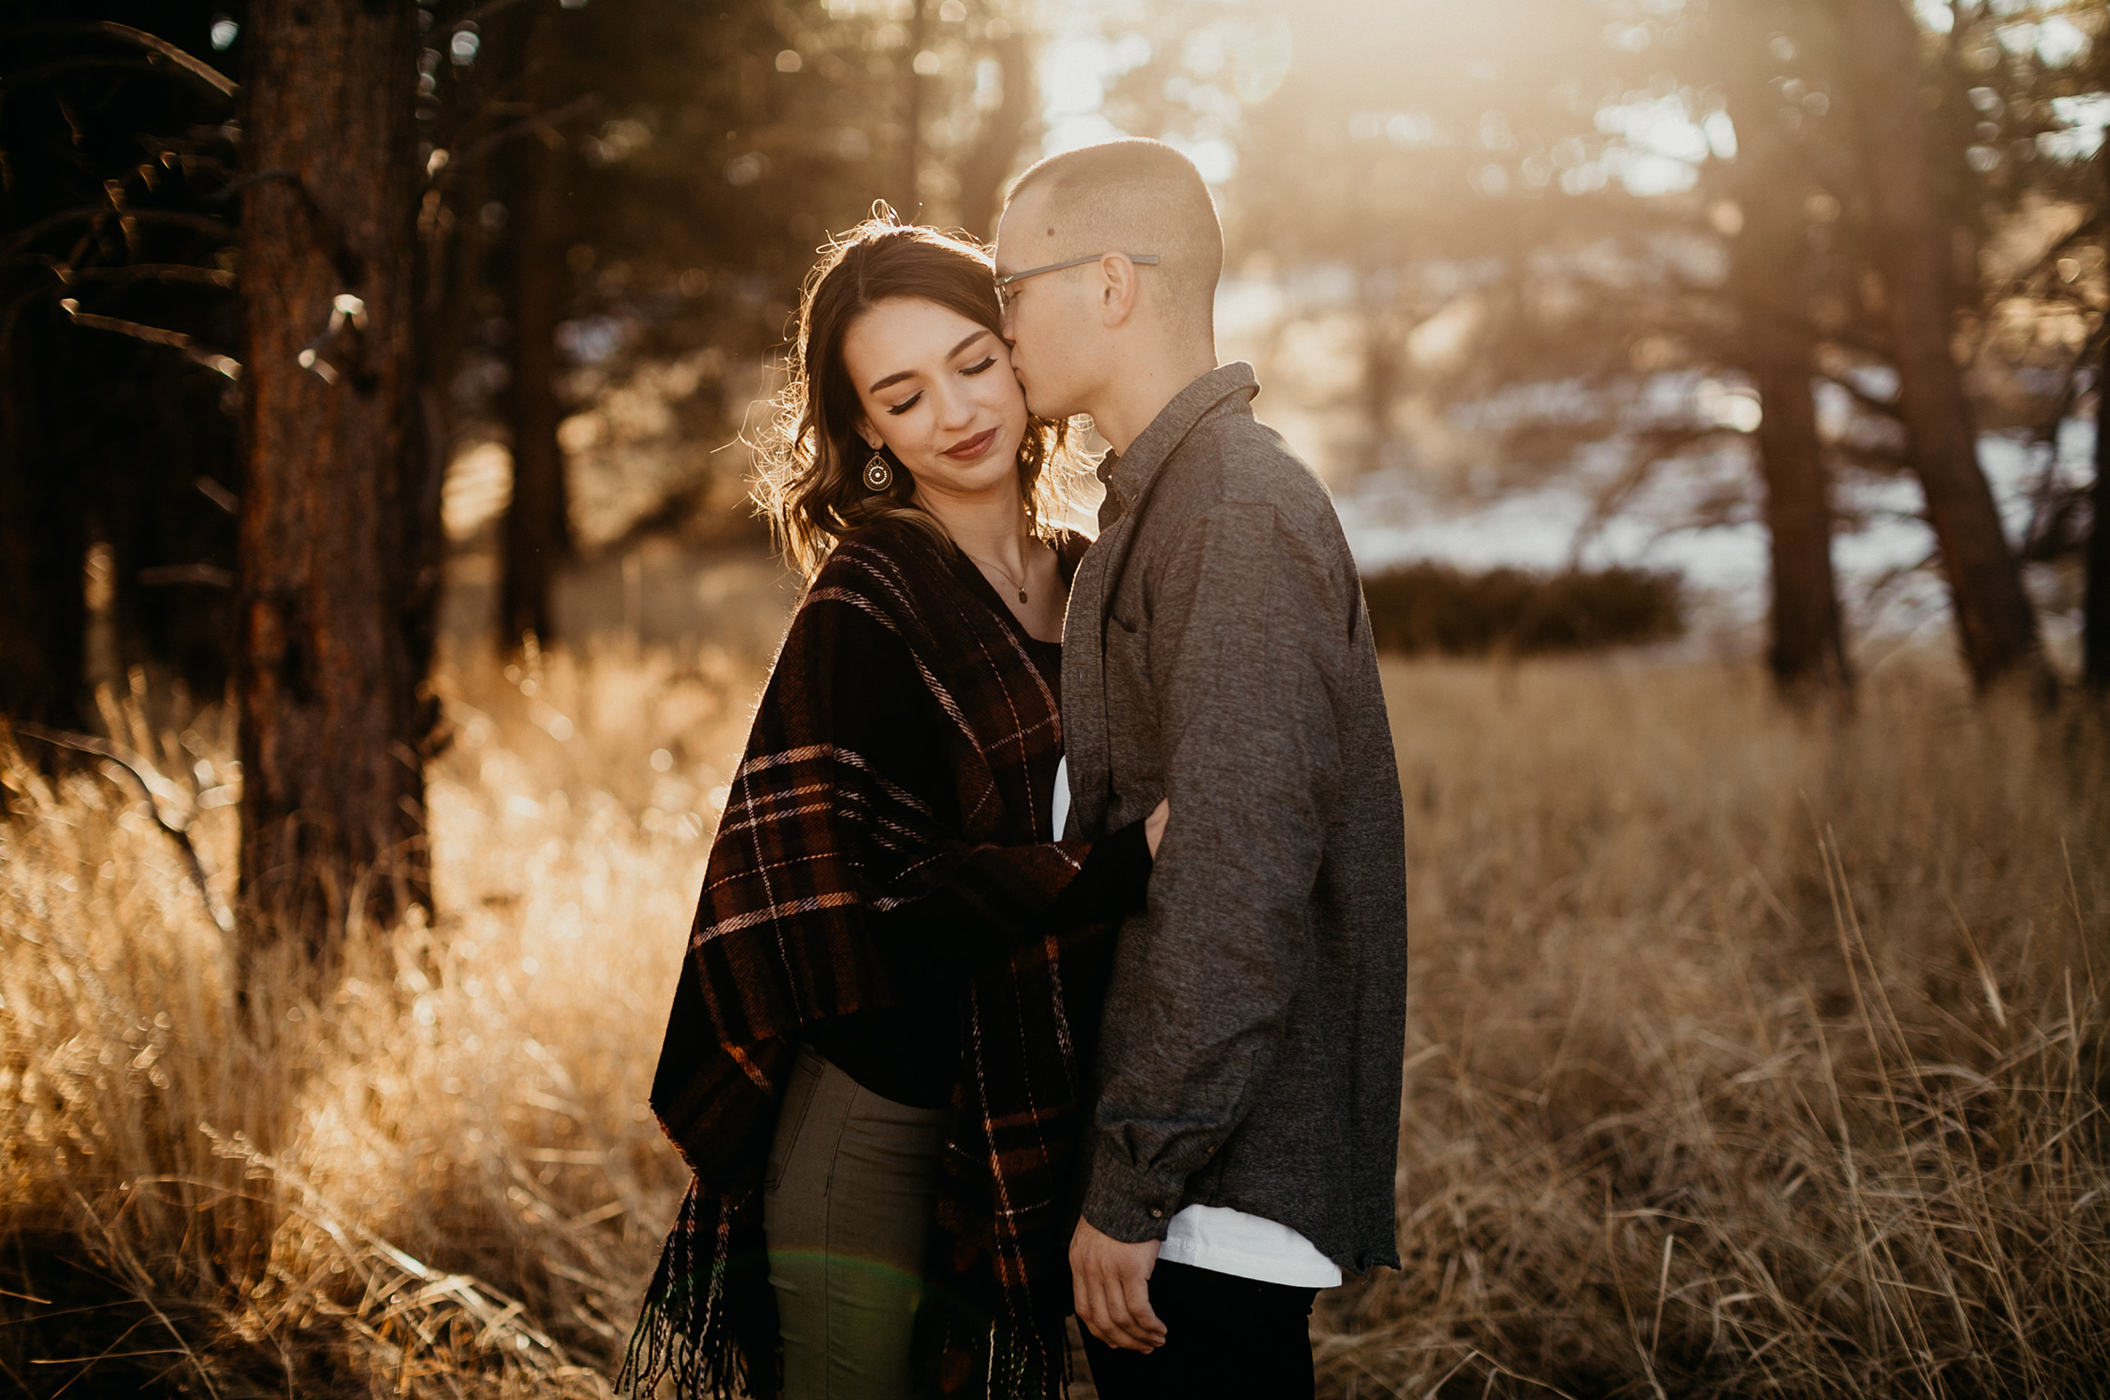 Rocky Mountain National Park Wedding Elopement Photographer Adventure Couples Portraits Best Estes Park Colorado Wyoming Mountain Liz Osban Photographer Engagement